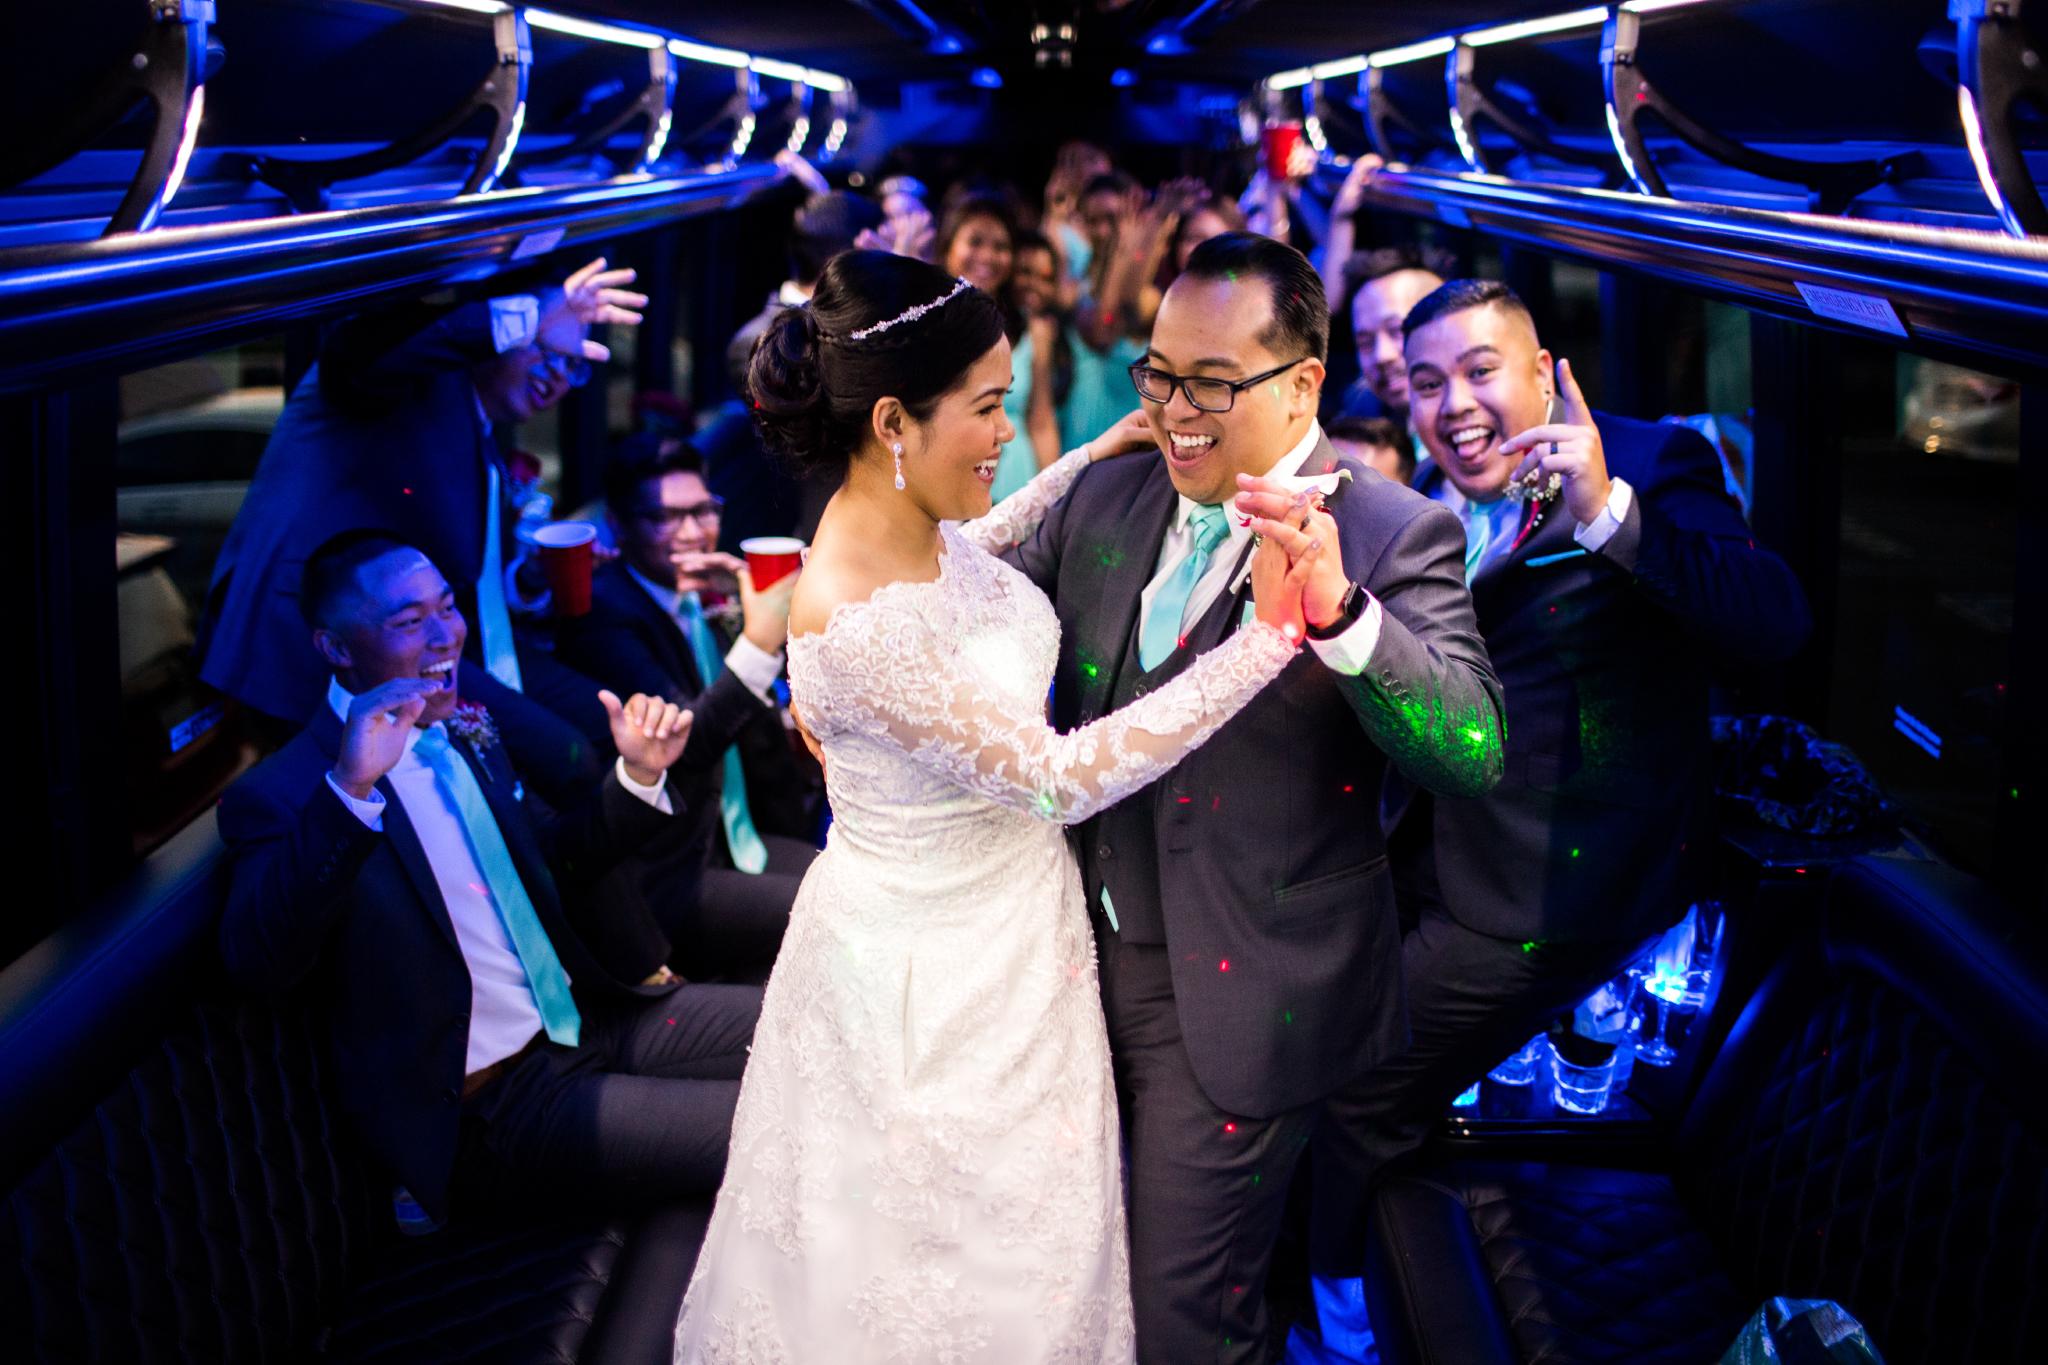 san diego wedding   photographer | couple dancing in train